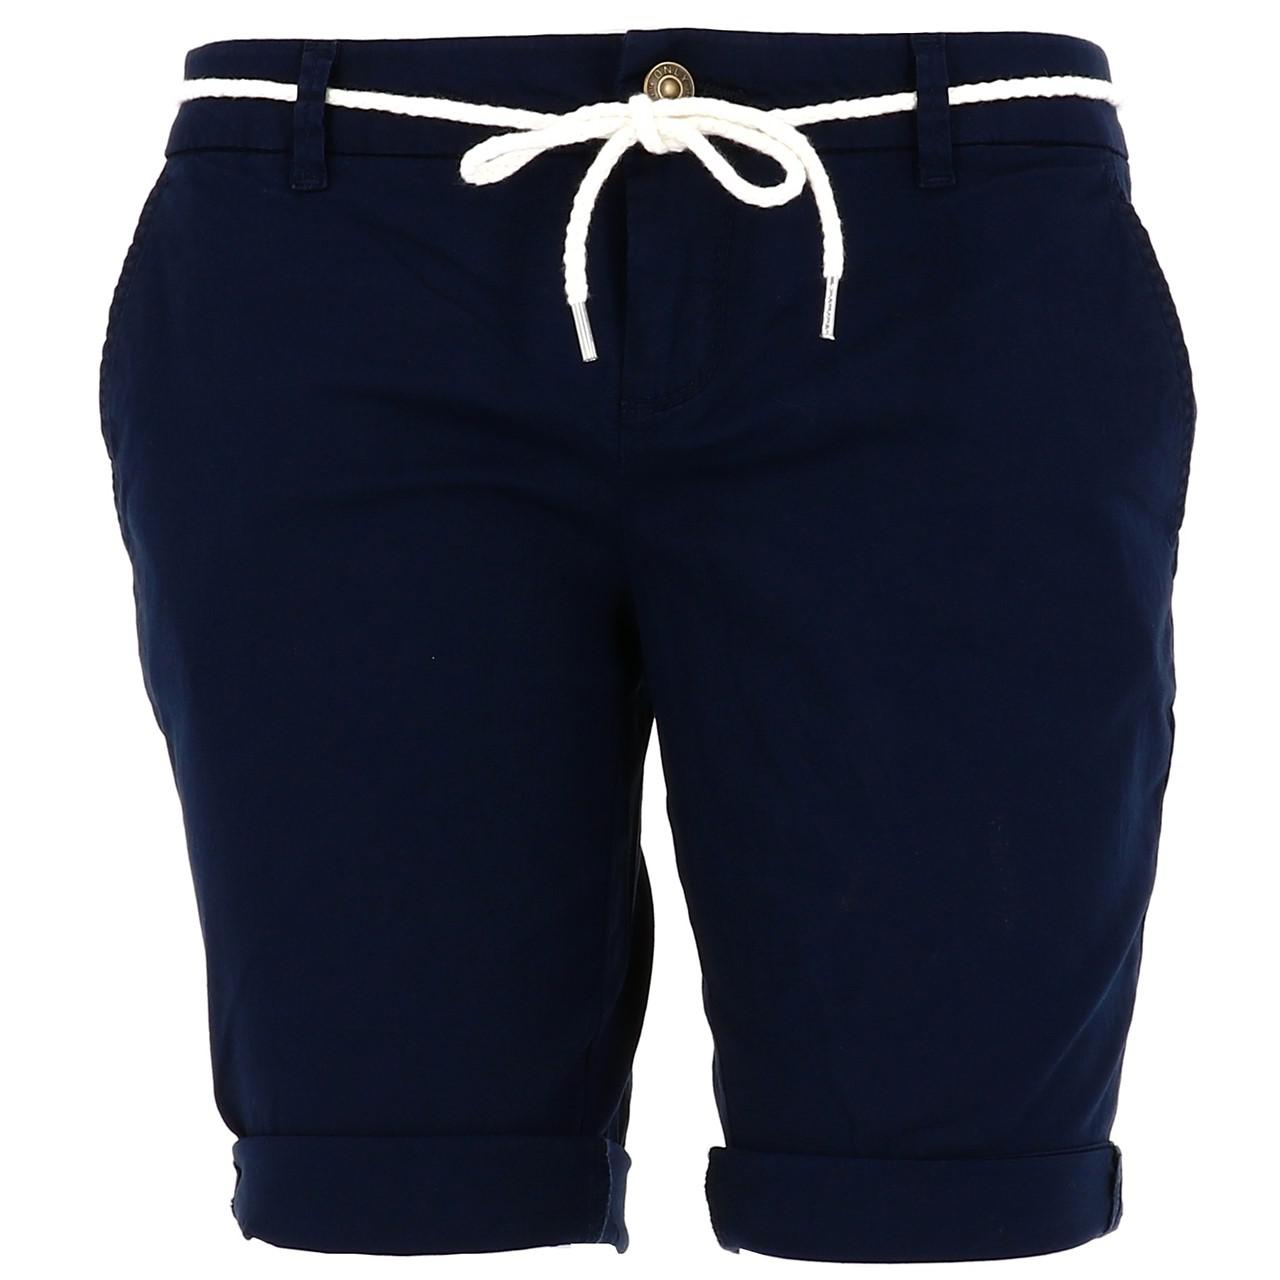 Bermuda-Shorts-Only-Paris-L-Chino-Navy-Shorts-Blue-18677-New